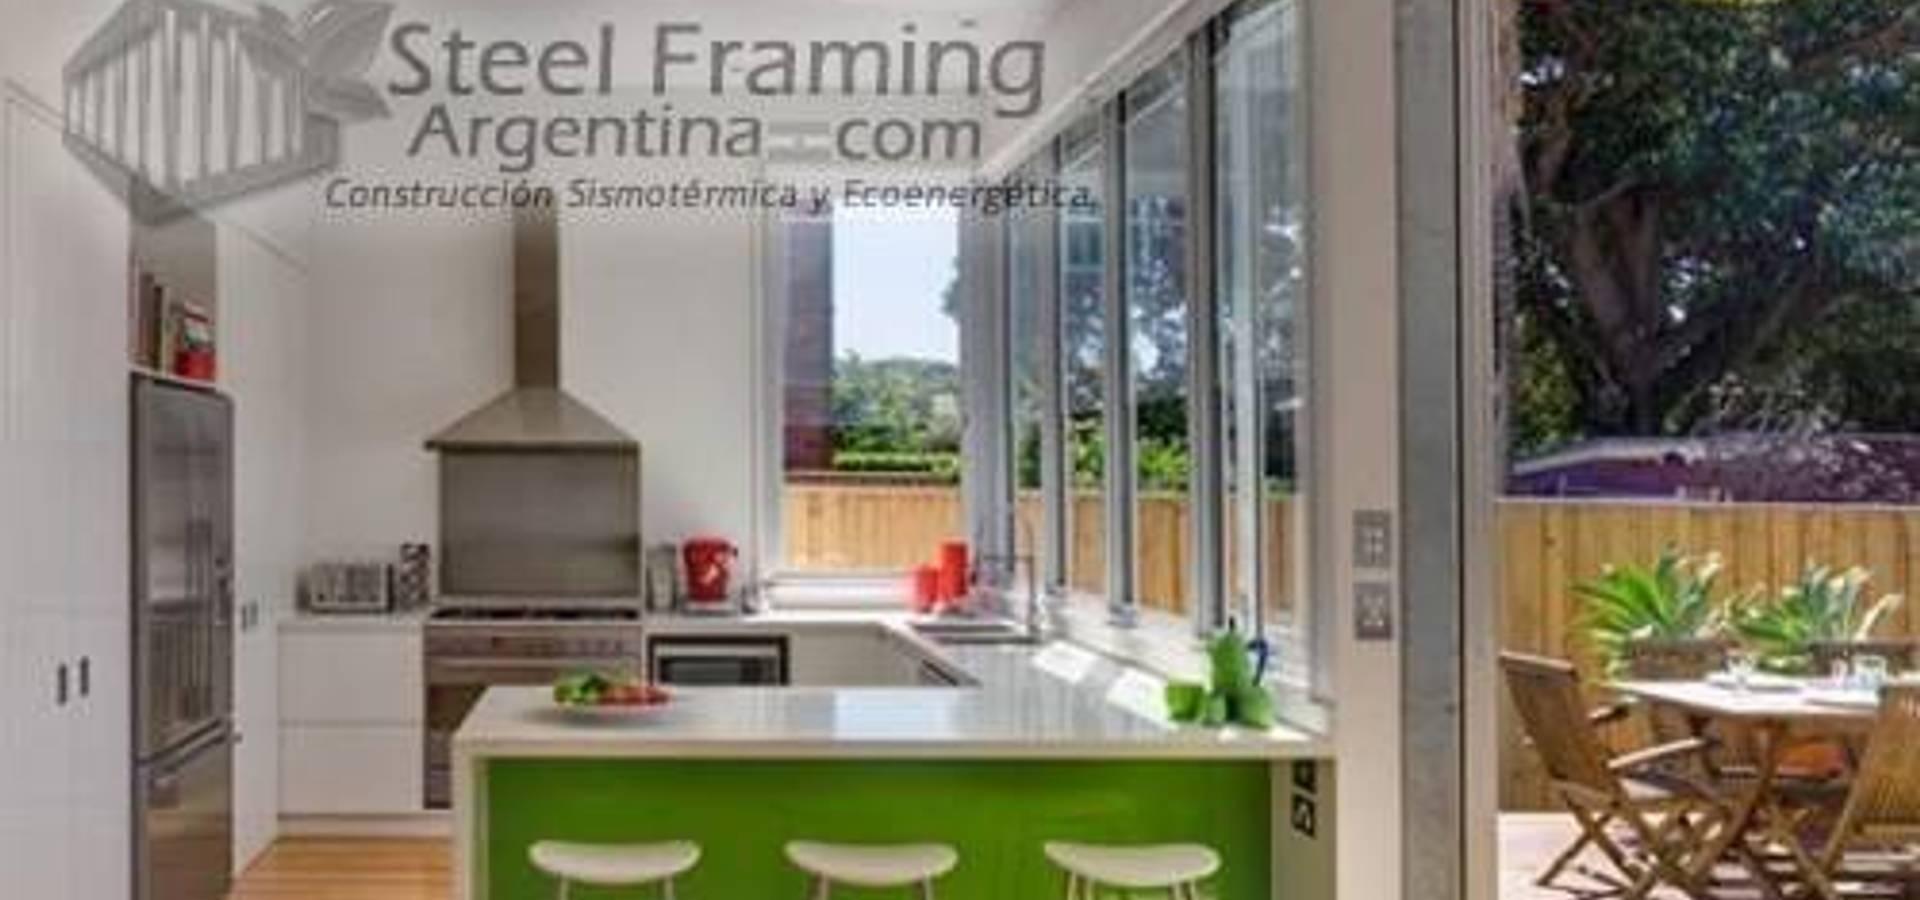 Steel Framing Argentina Profesjonali Ci W Kategorii